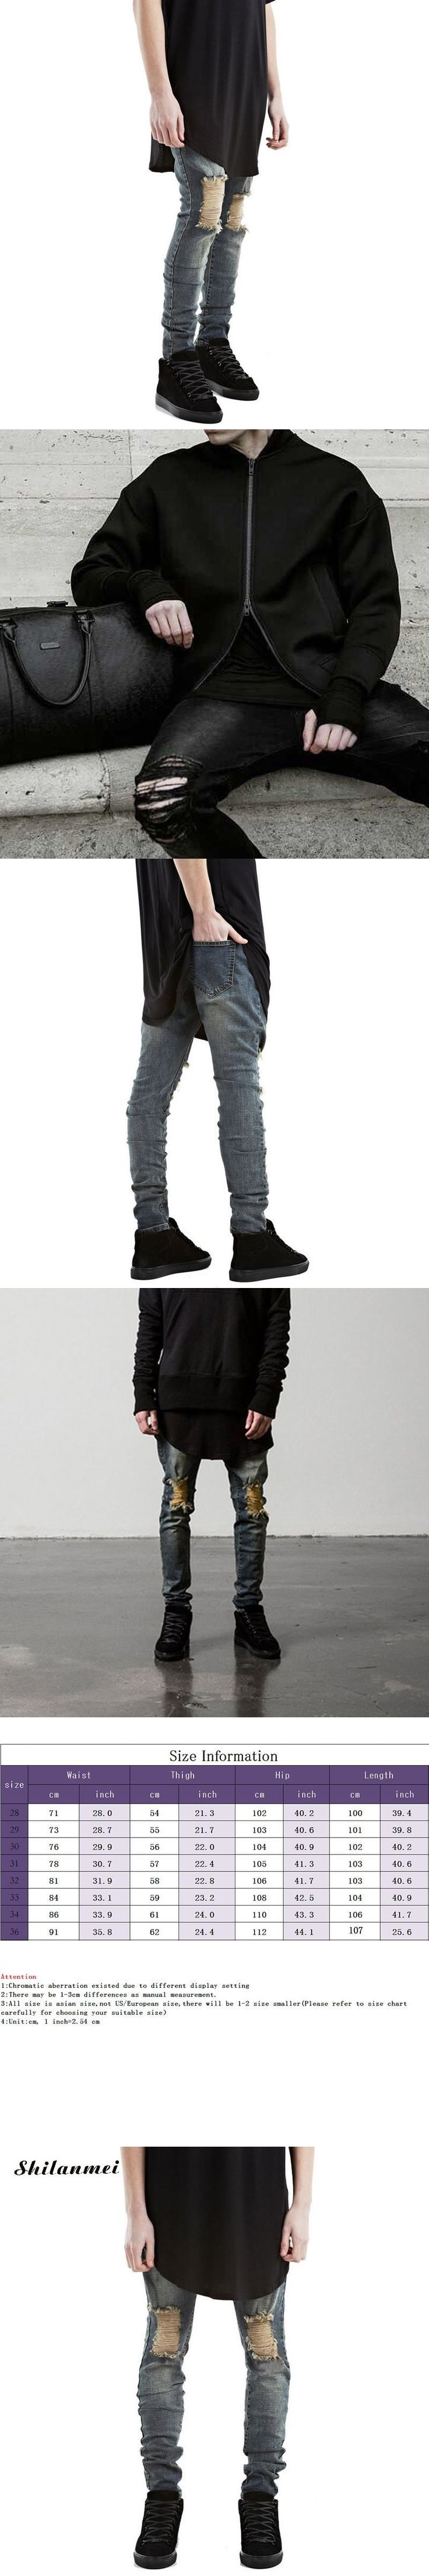 2017 hip hoop Men Jeans Stretch Destroyed Ripped Design Fashion boyfriend stylish Skinny straight fit denim Jeans slim homme #mensjeans2017 #mensjeansslim